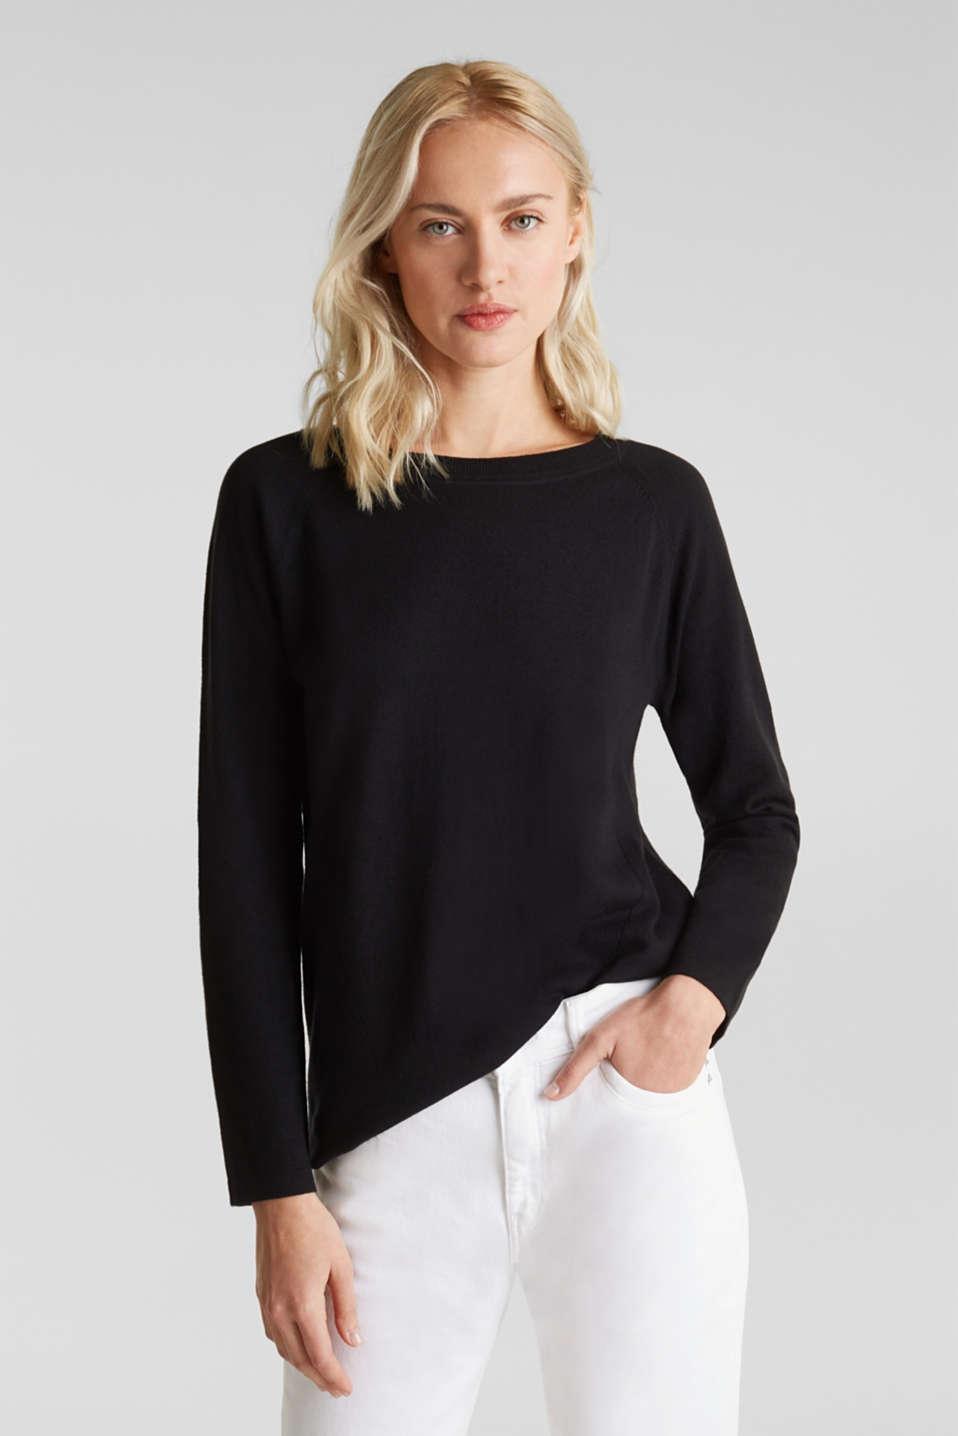 With linen: Jumper with open-work patterned details, BLACK, detail image number 0